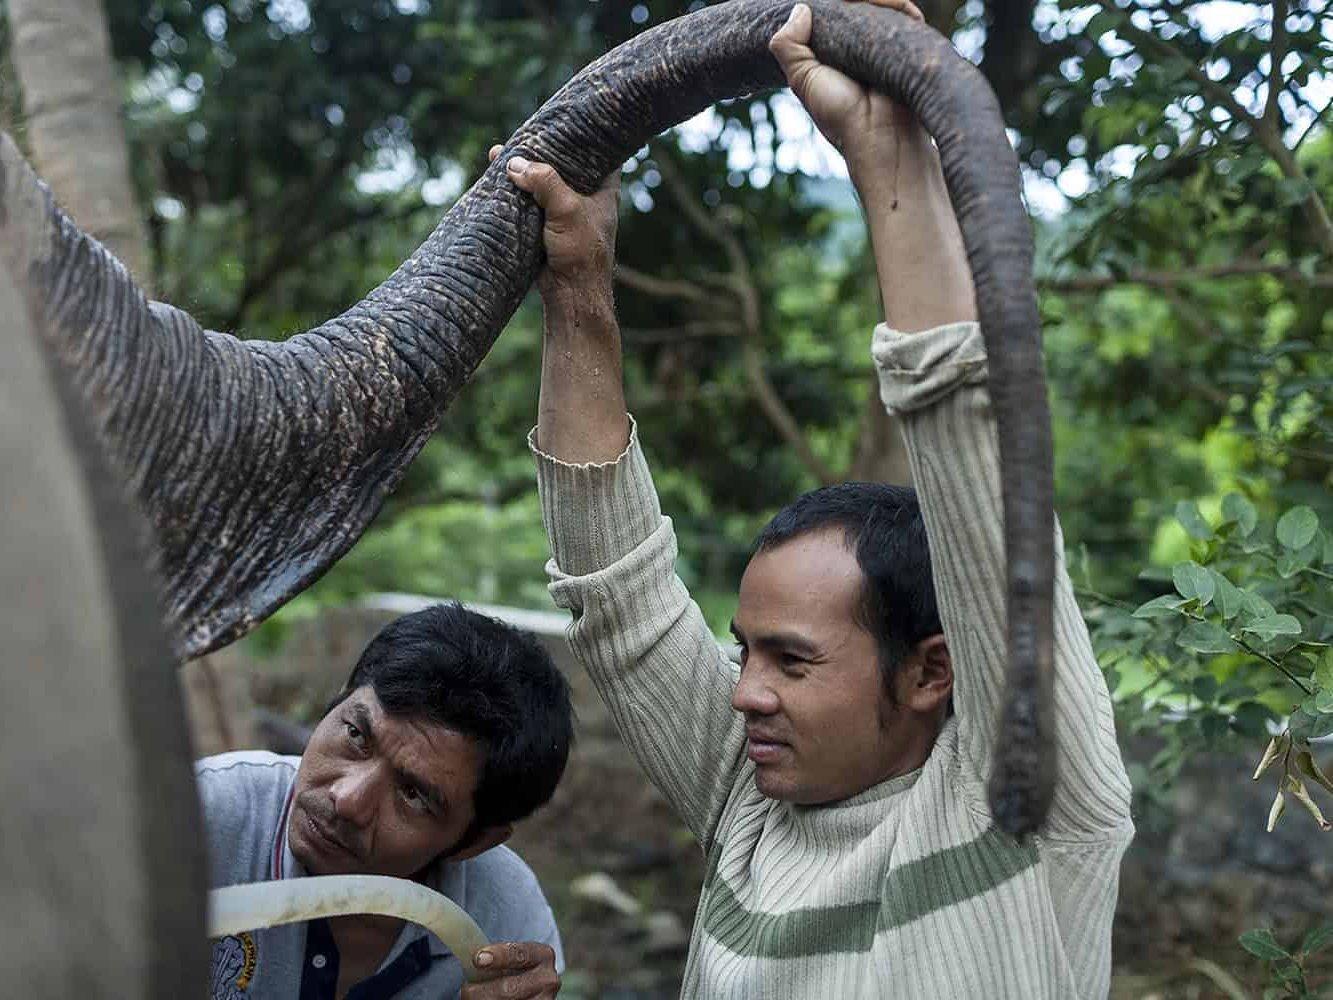 vietnam photographer mahout family binhdang 19